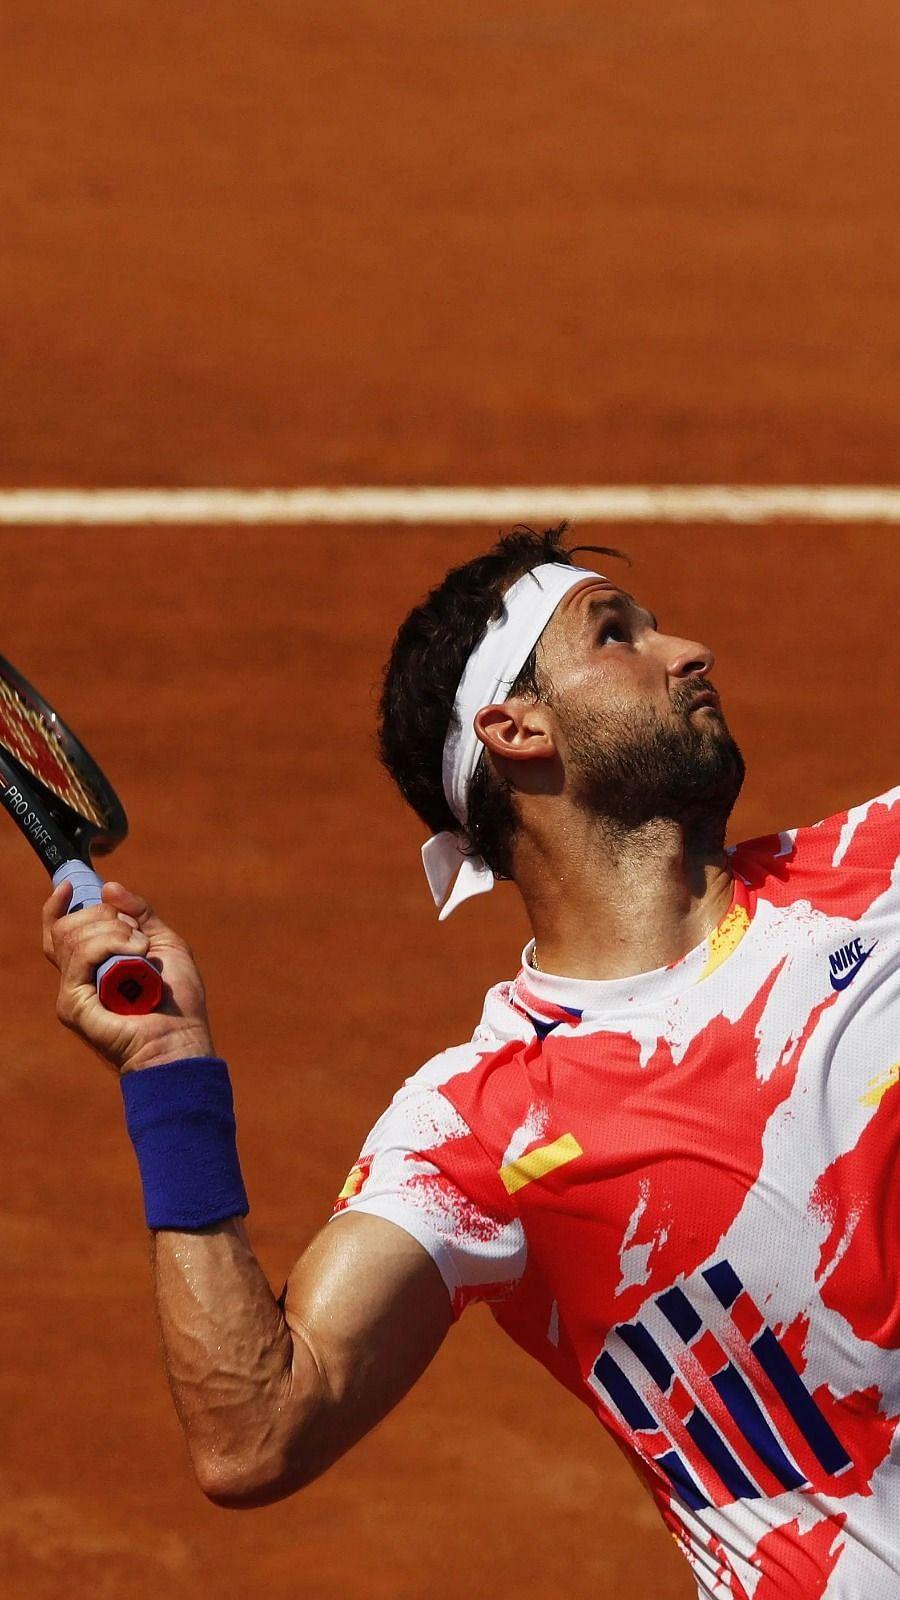 Rome Masters Grigor Dimitrov Vs Denis Shapovalov Preview Head To Head Prediction Italian Open 2020